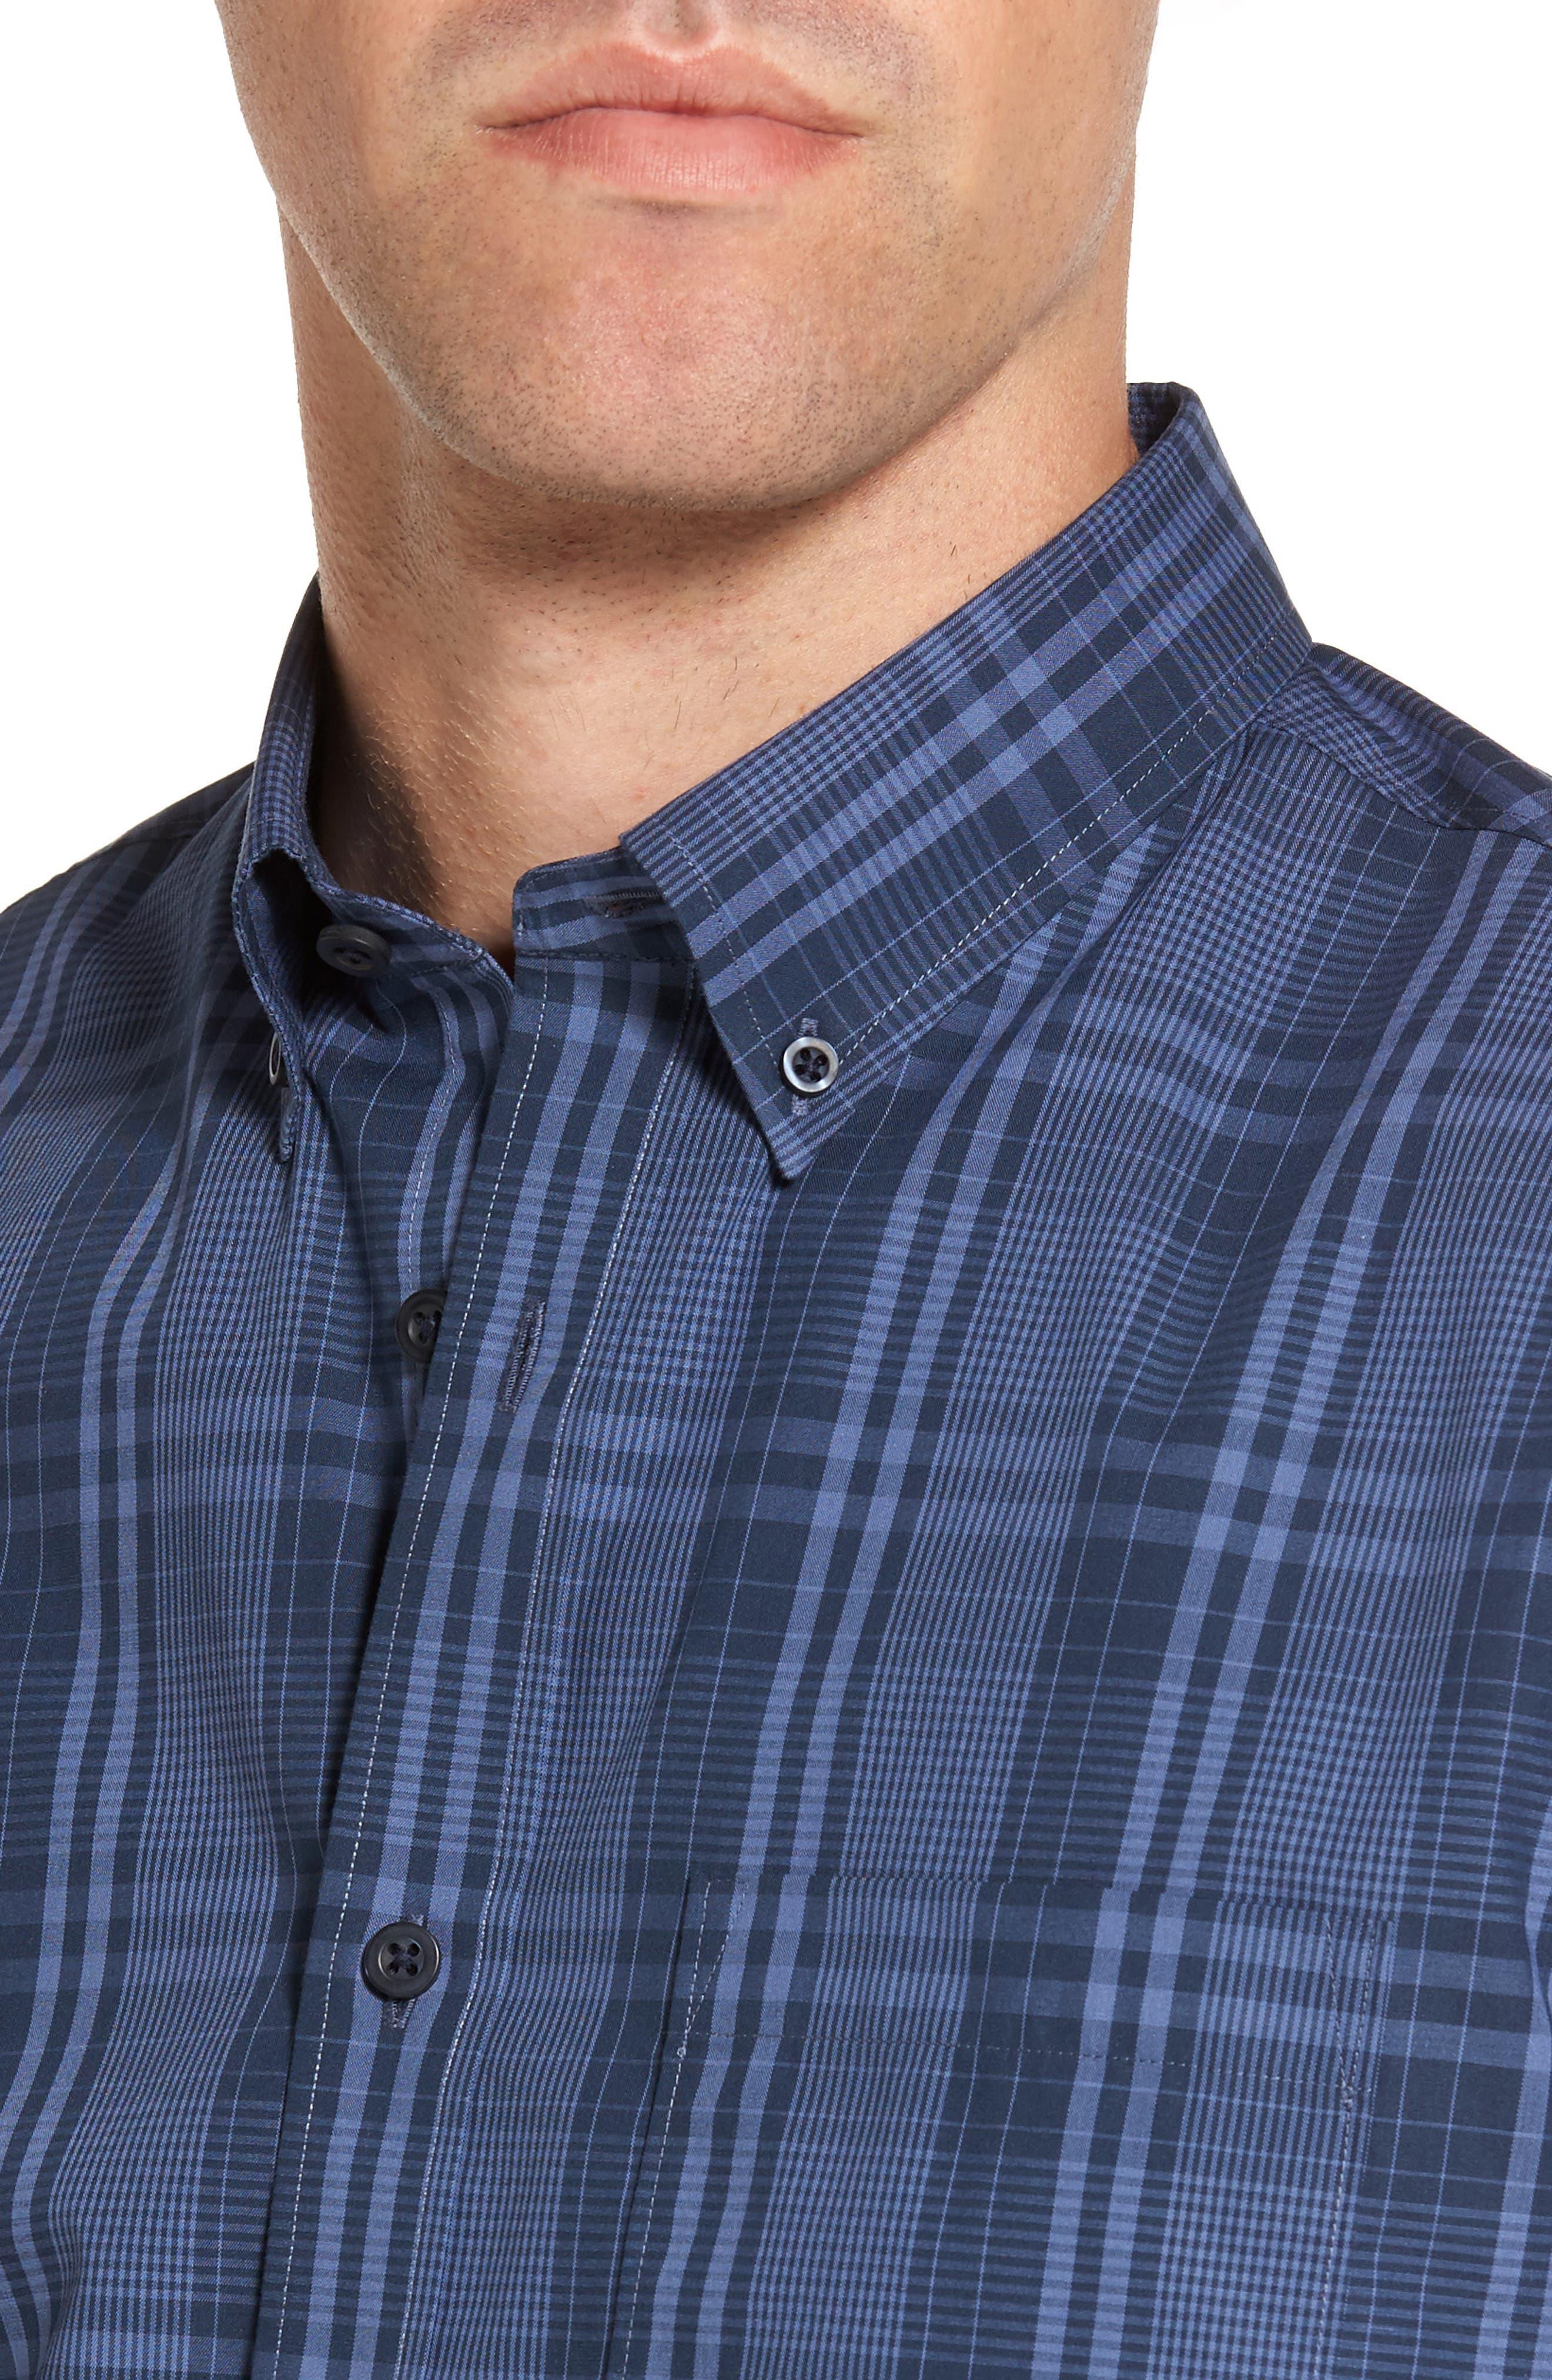 Slim Fit Plaid Sport Shirt,                             Alternate thumbnail 4, color,                             Navy Iris Blue Plaid